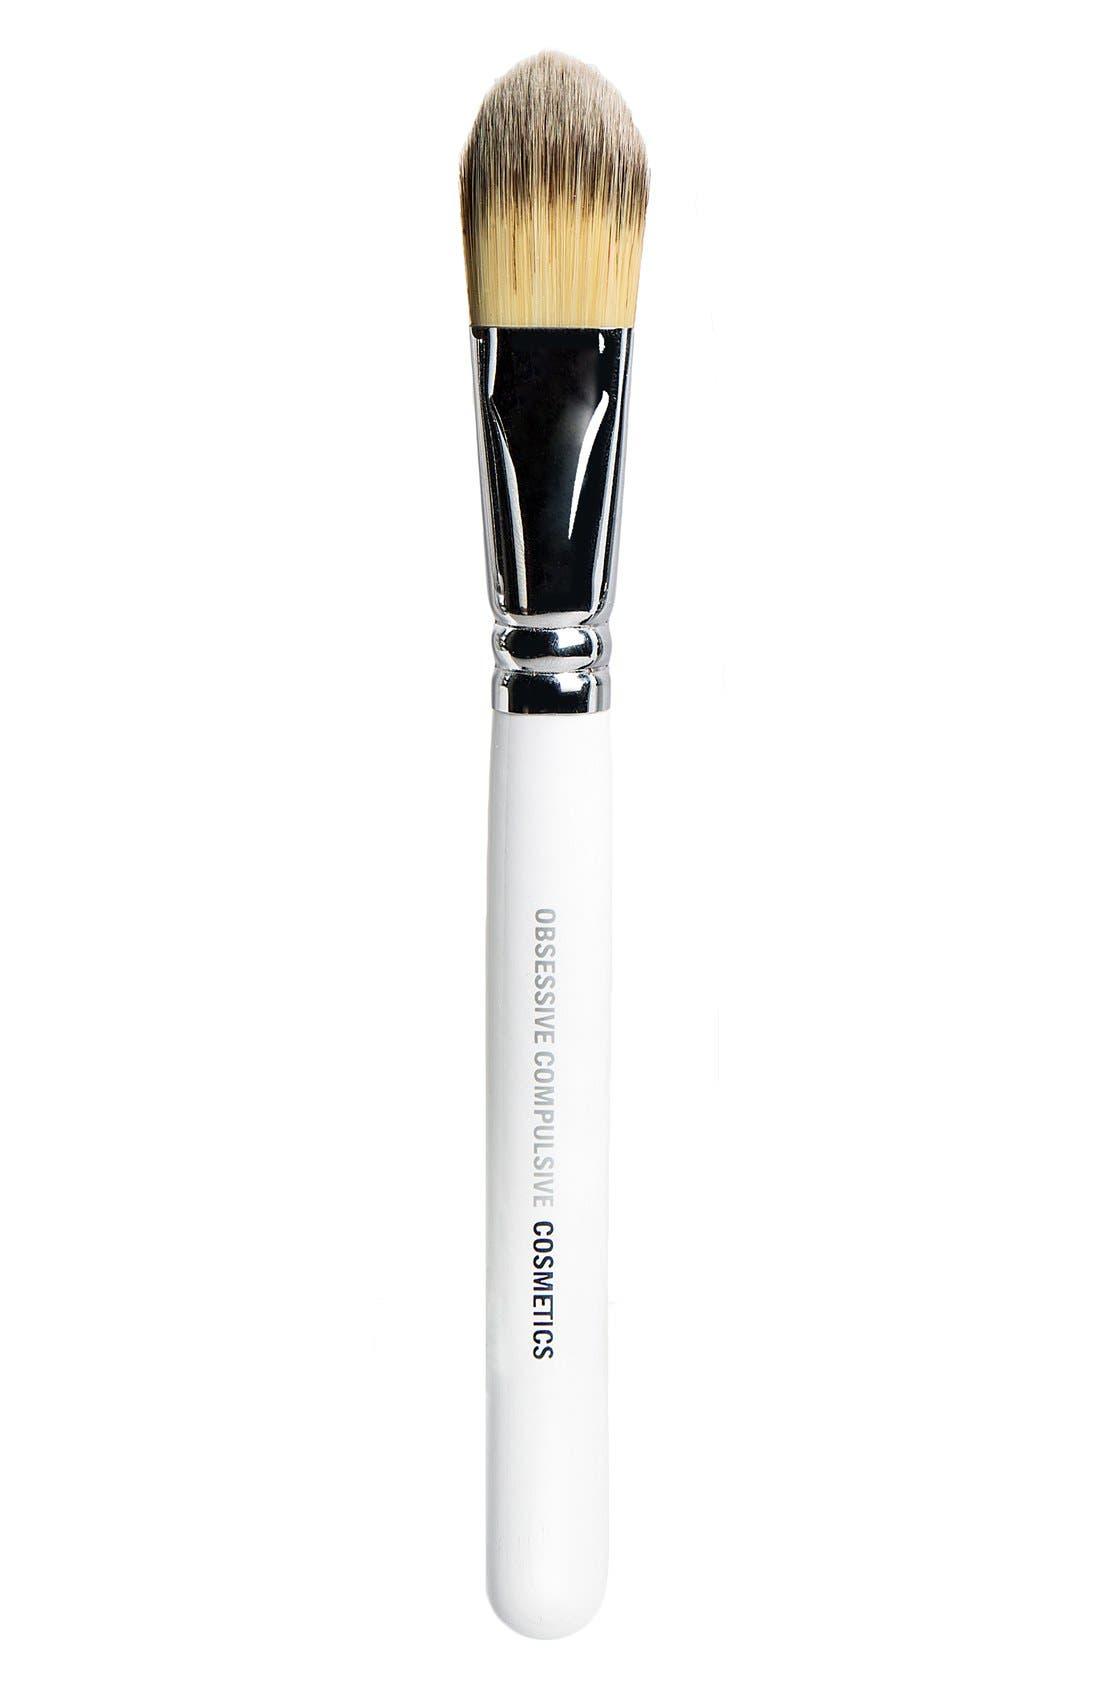 Obsessive Compulsive Cosmetics Foundation Brush